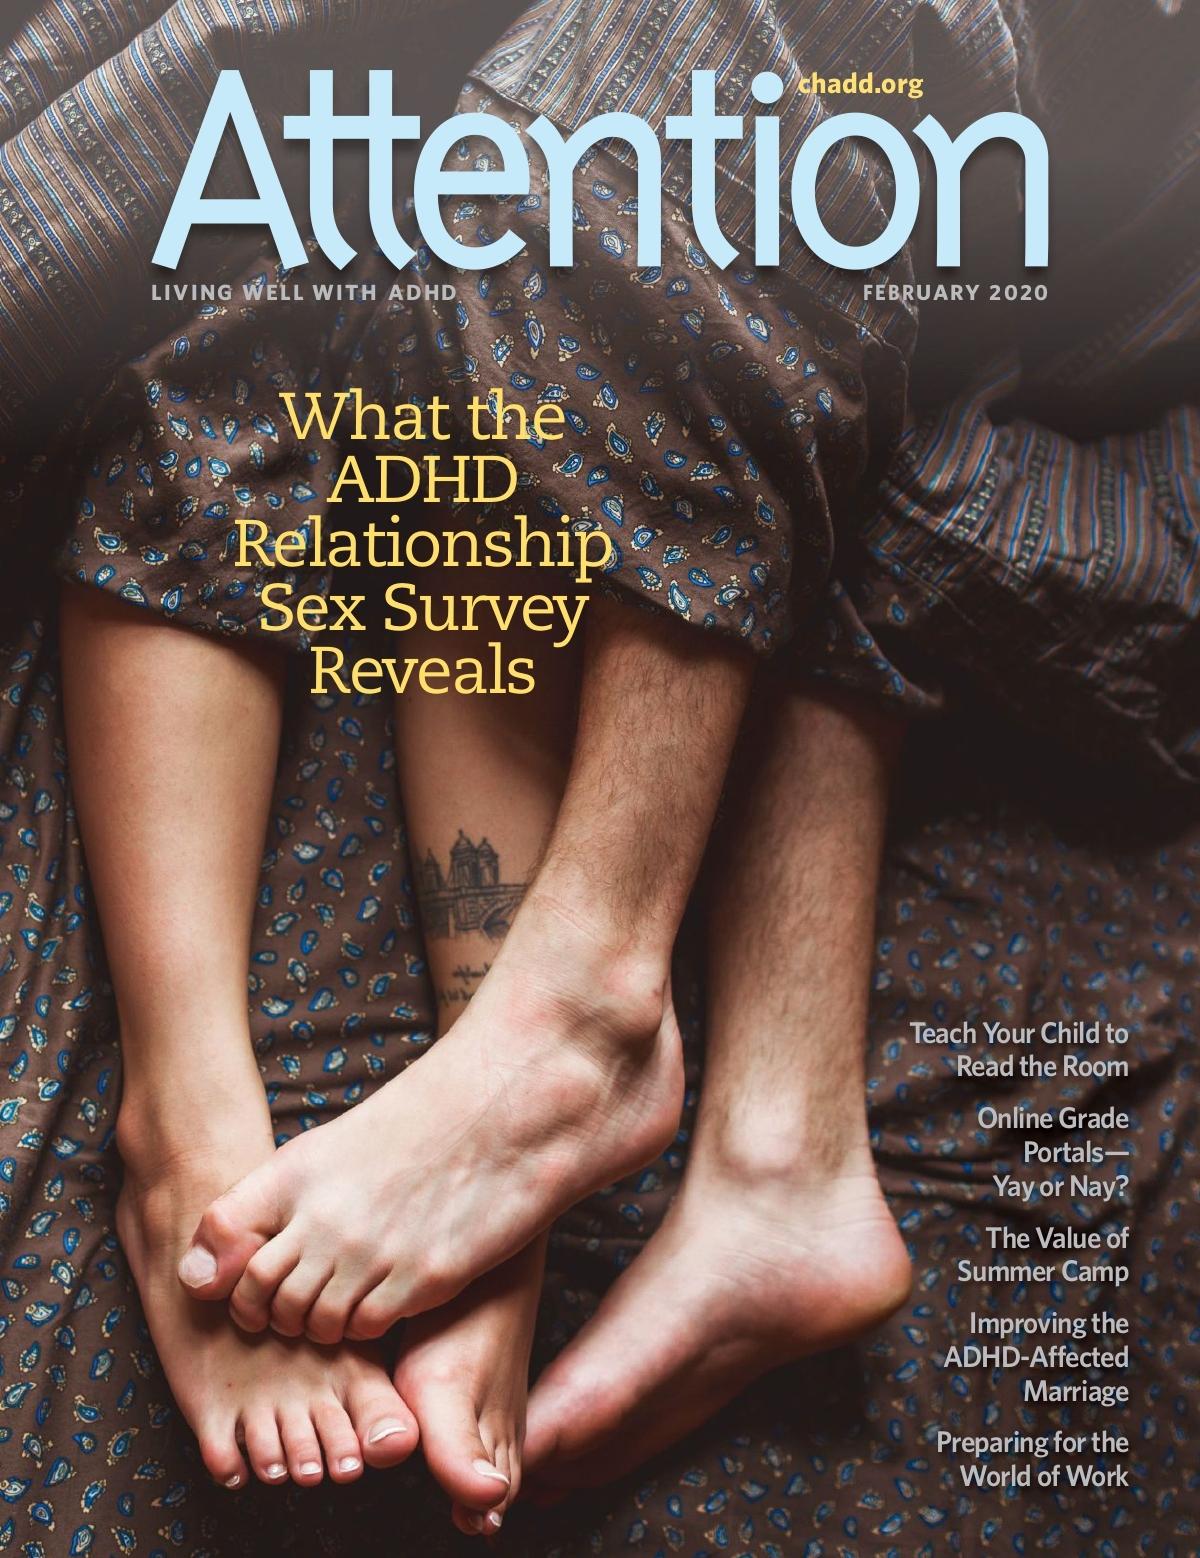 Attention Magazine February 2020